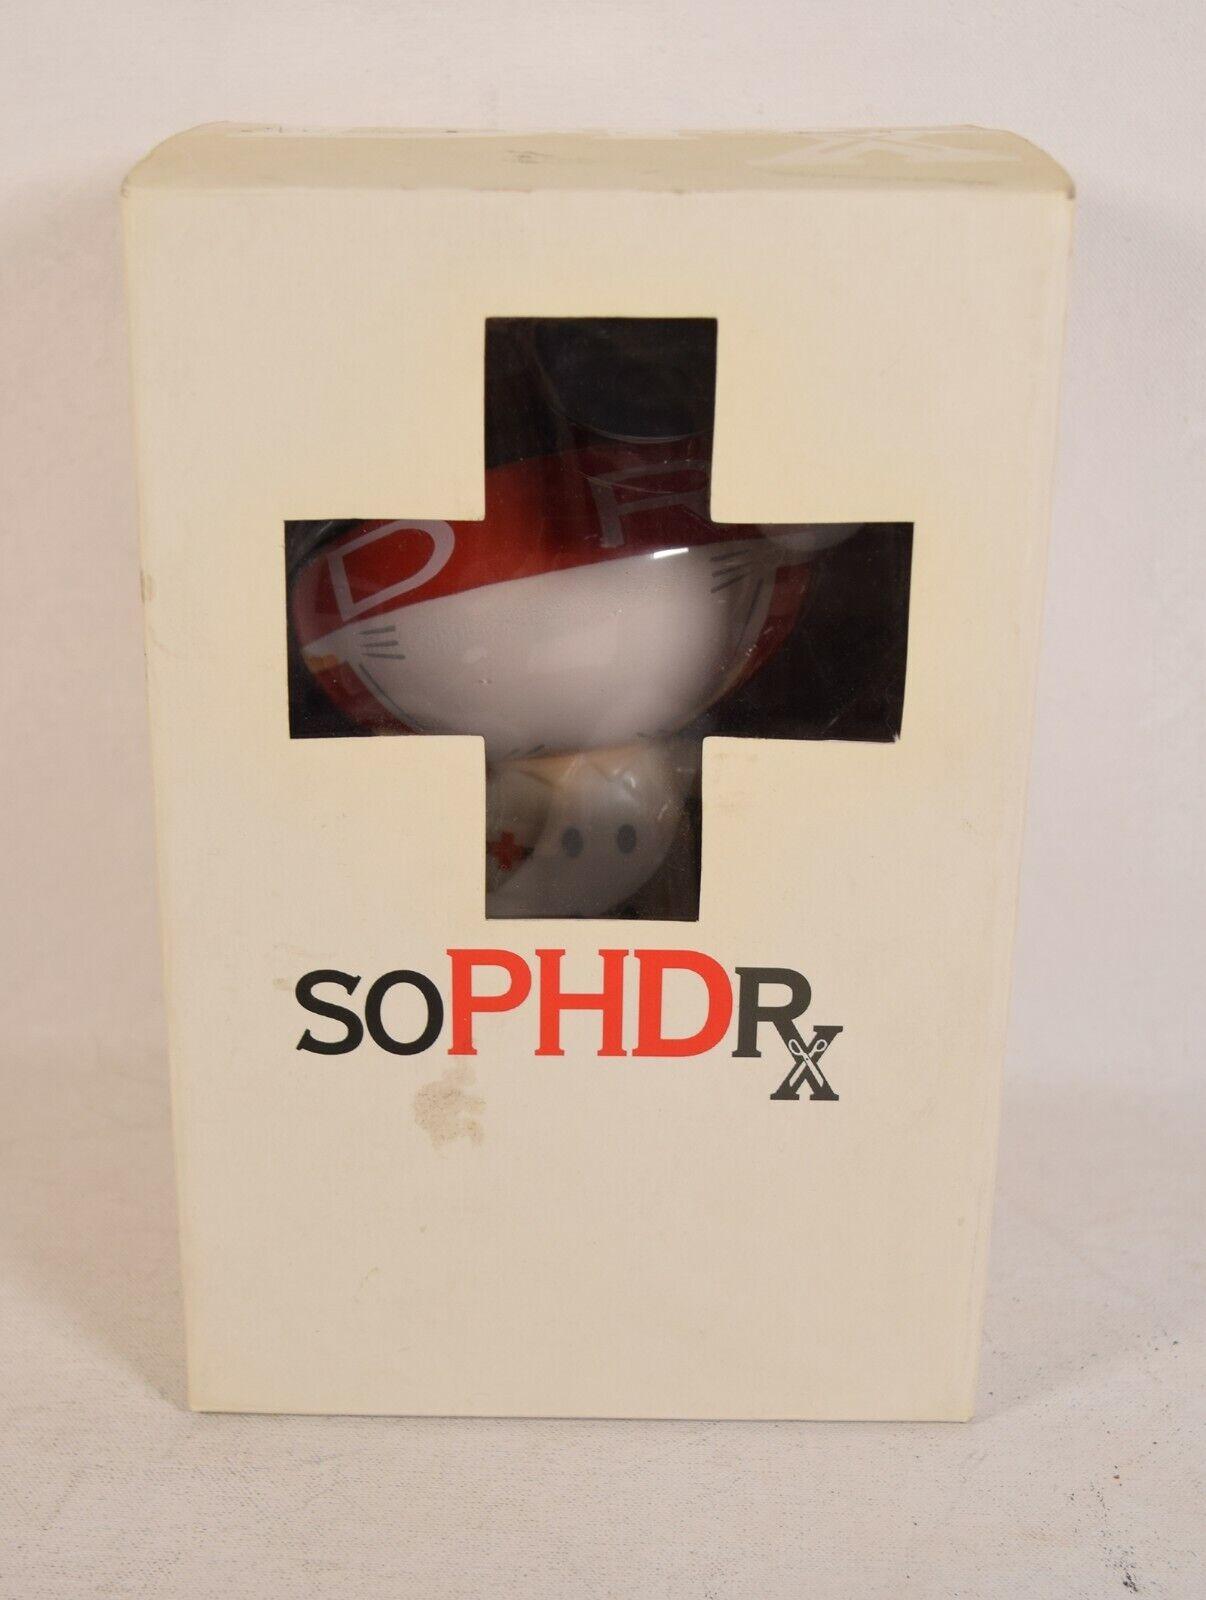 Dr. Romanelli soPHDRx Sophnet Vinyl Figure Doctor X Span Of Sunset 6